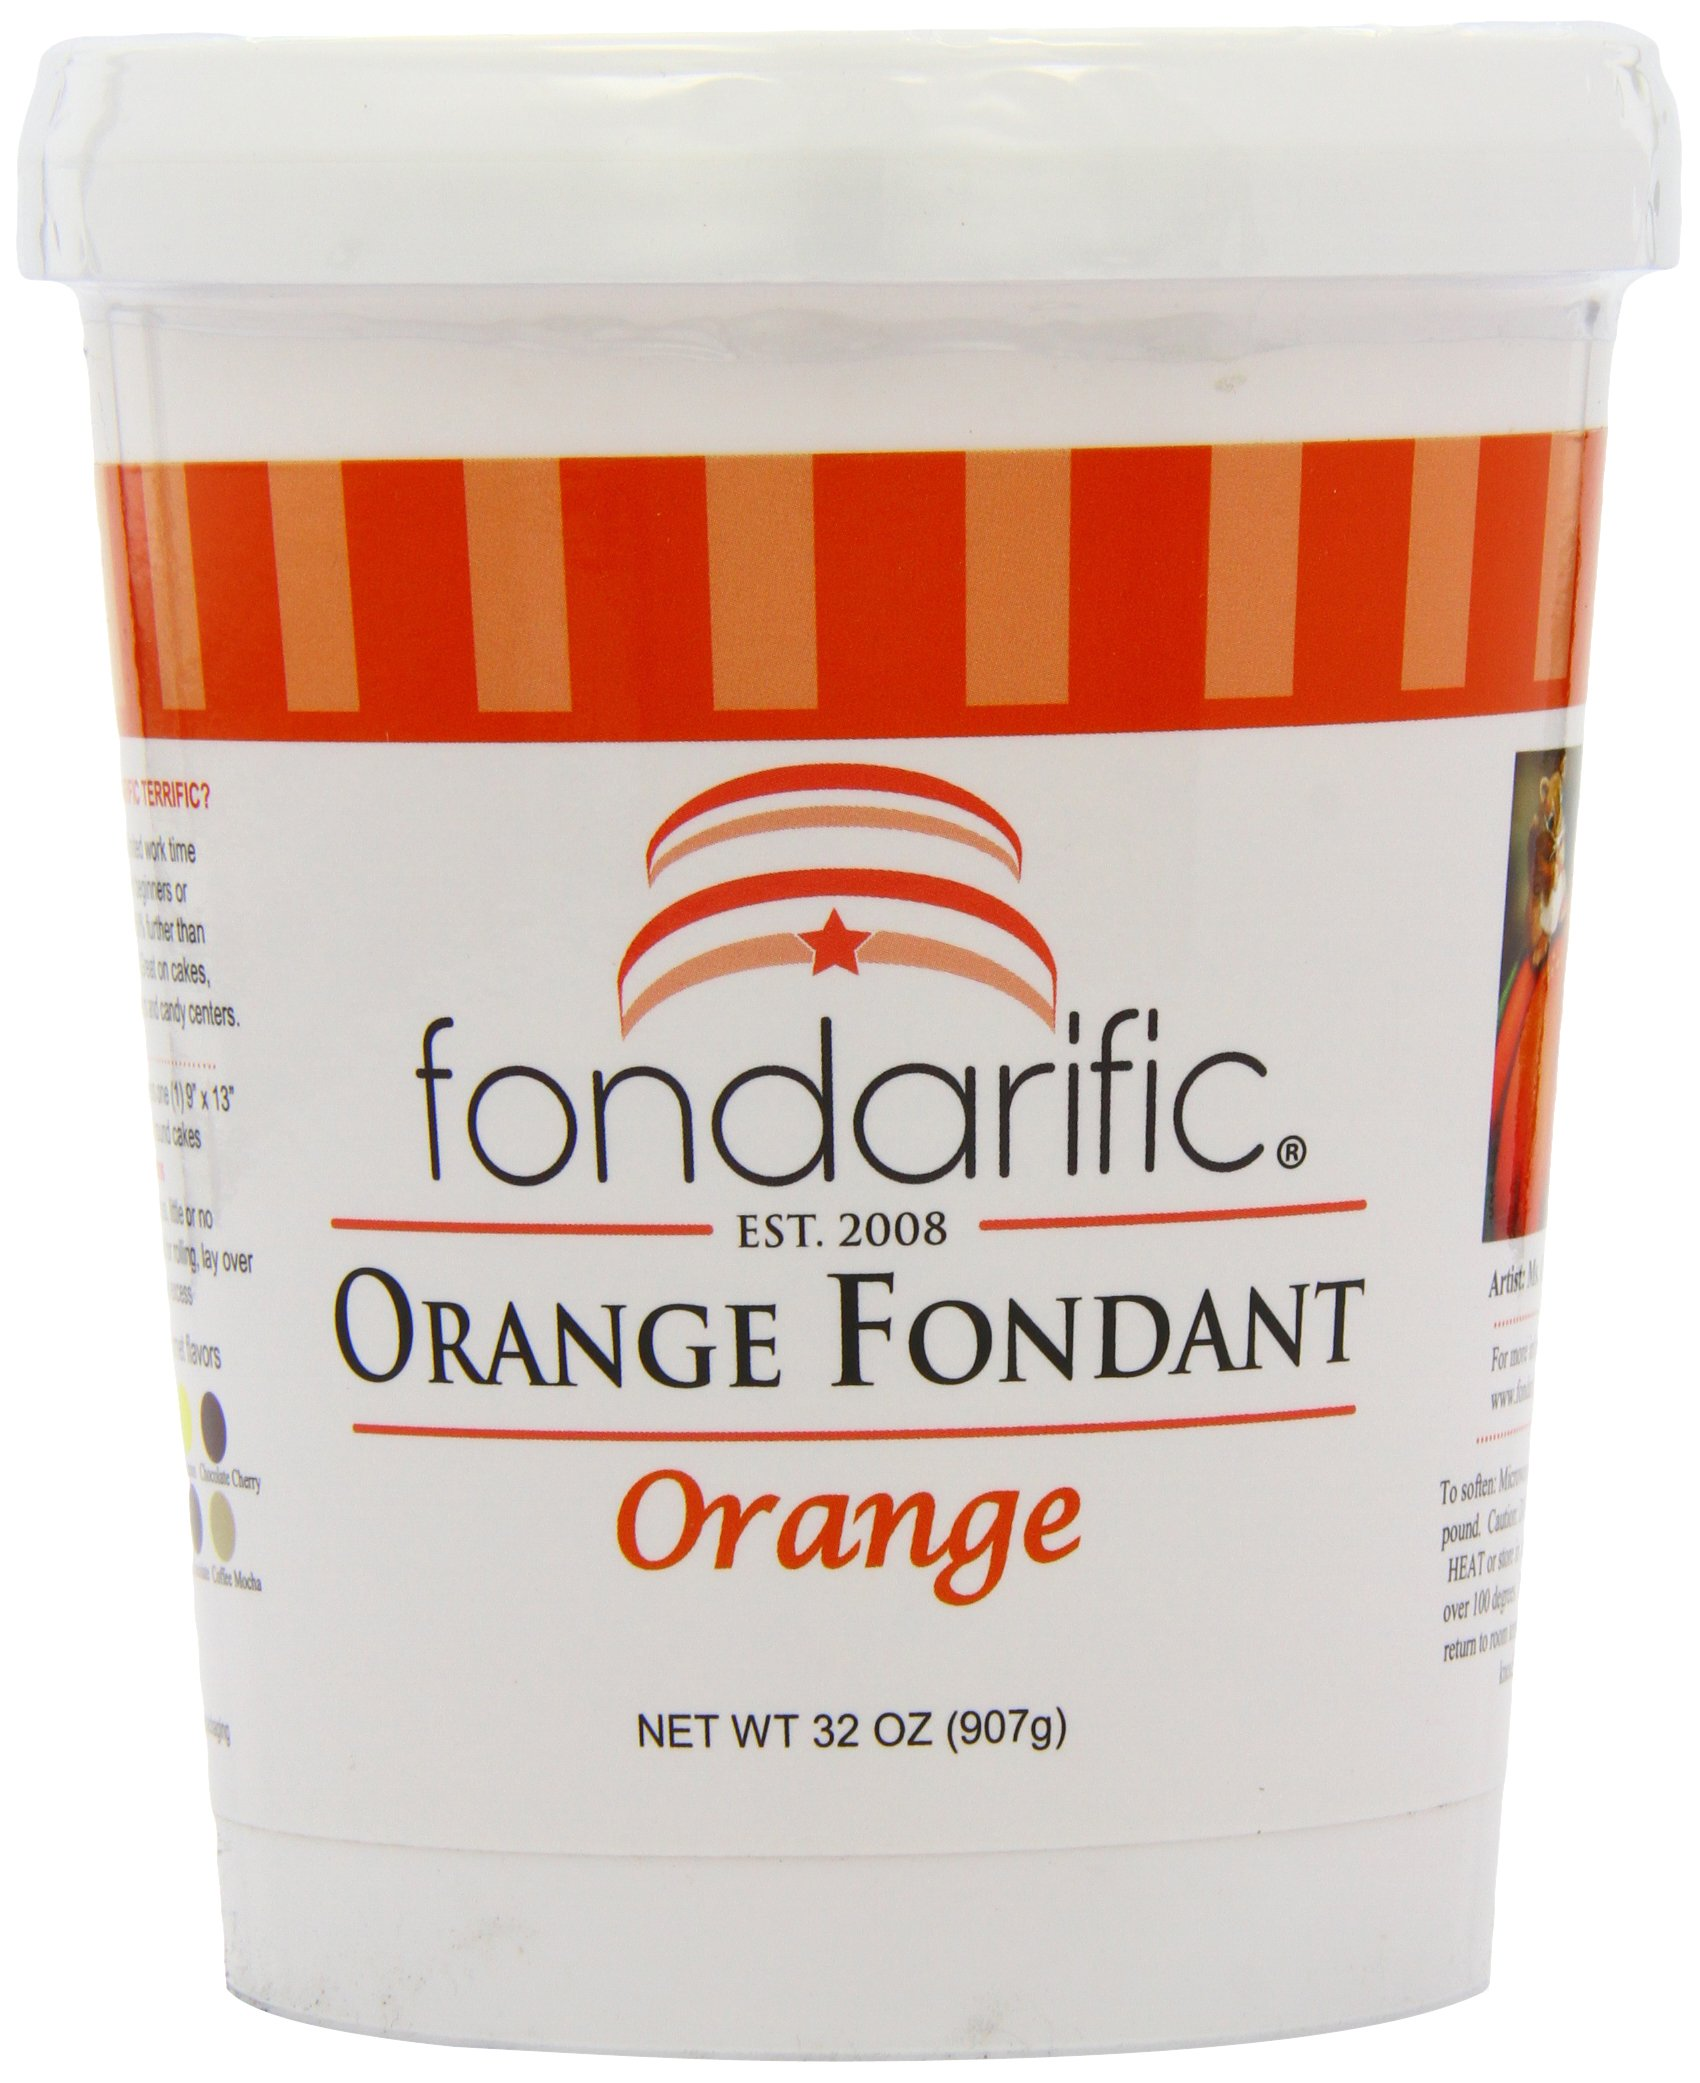 Fondarific Orange Fondant, 2-Pounds